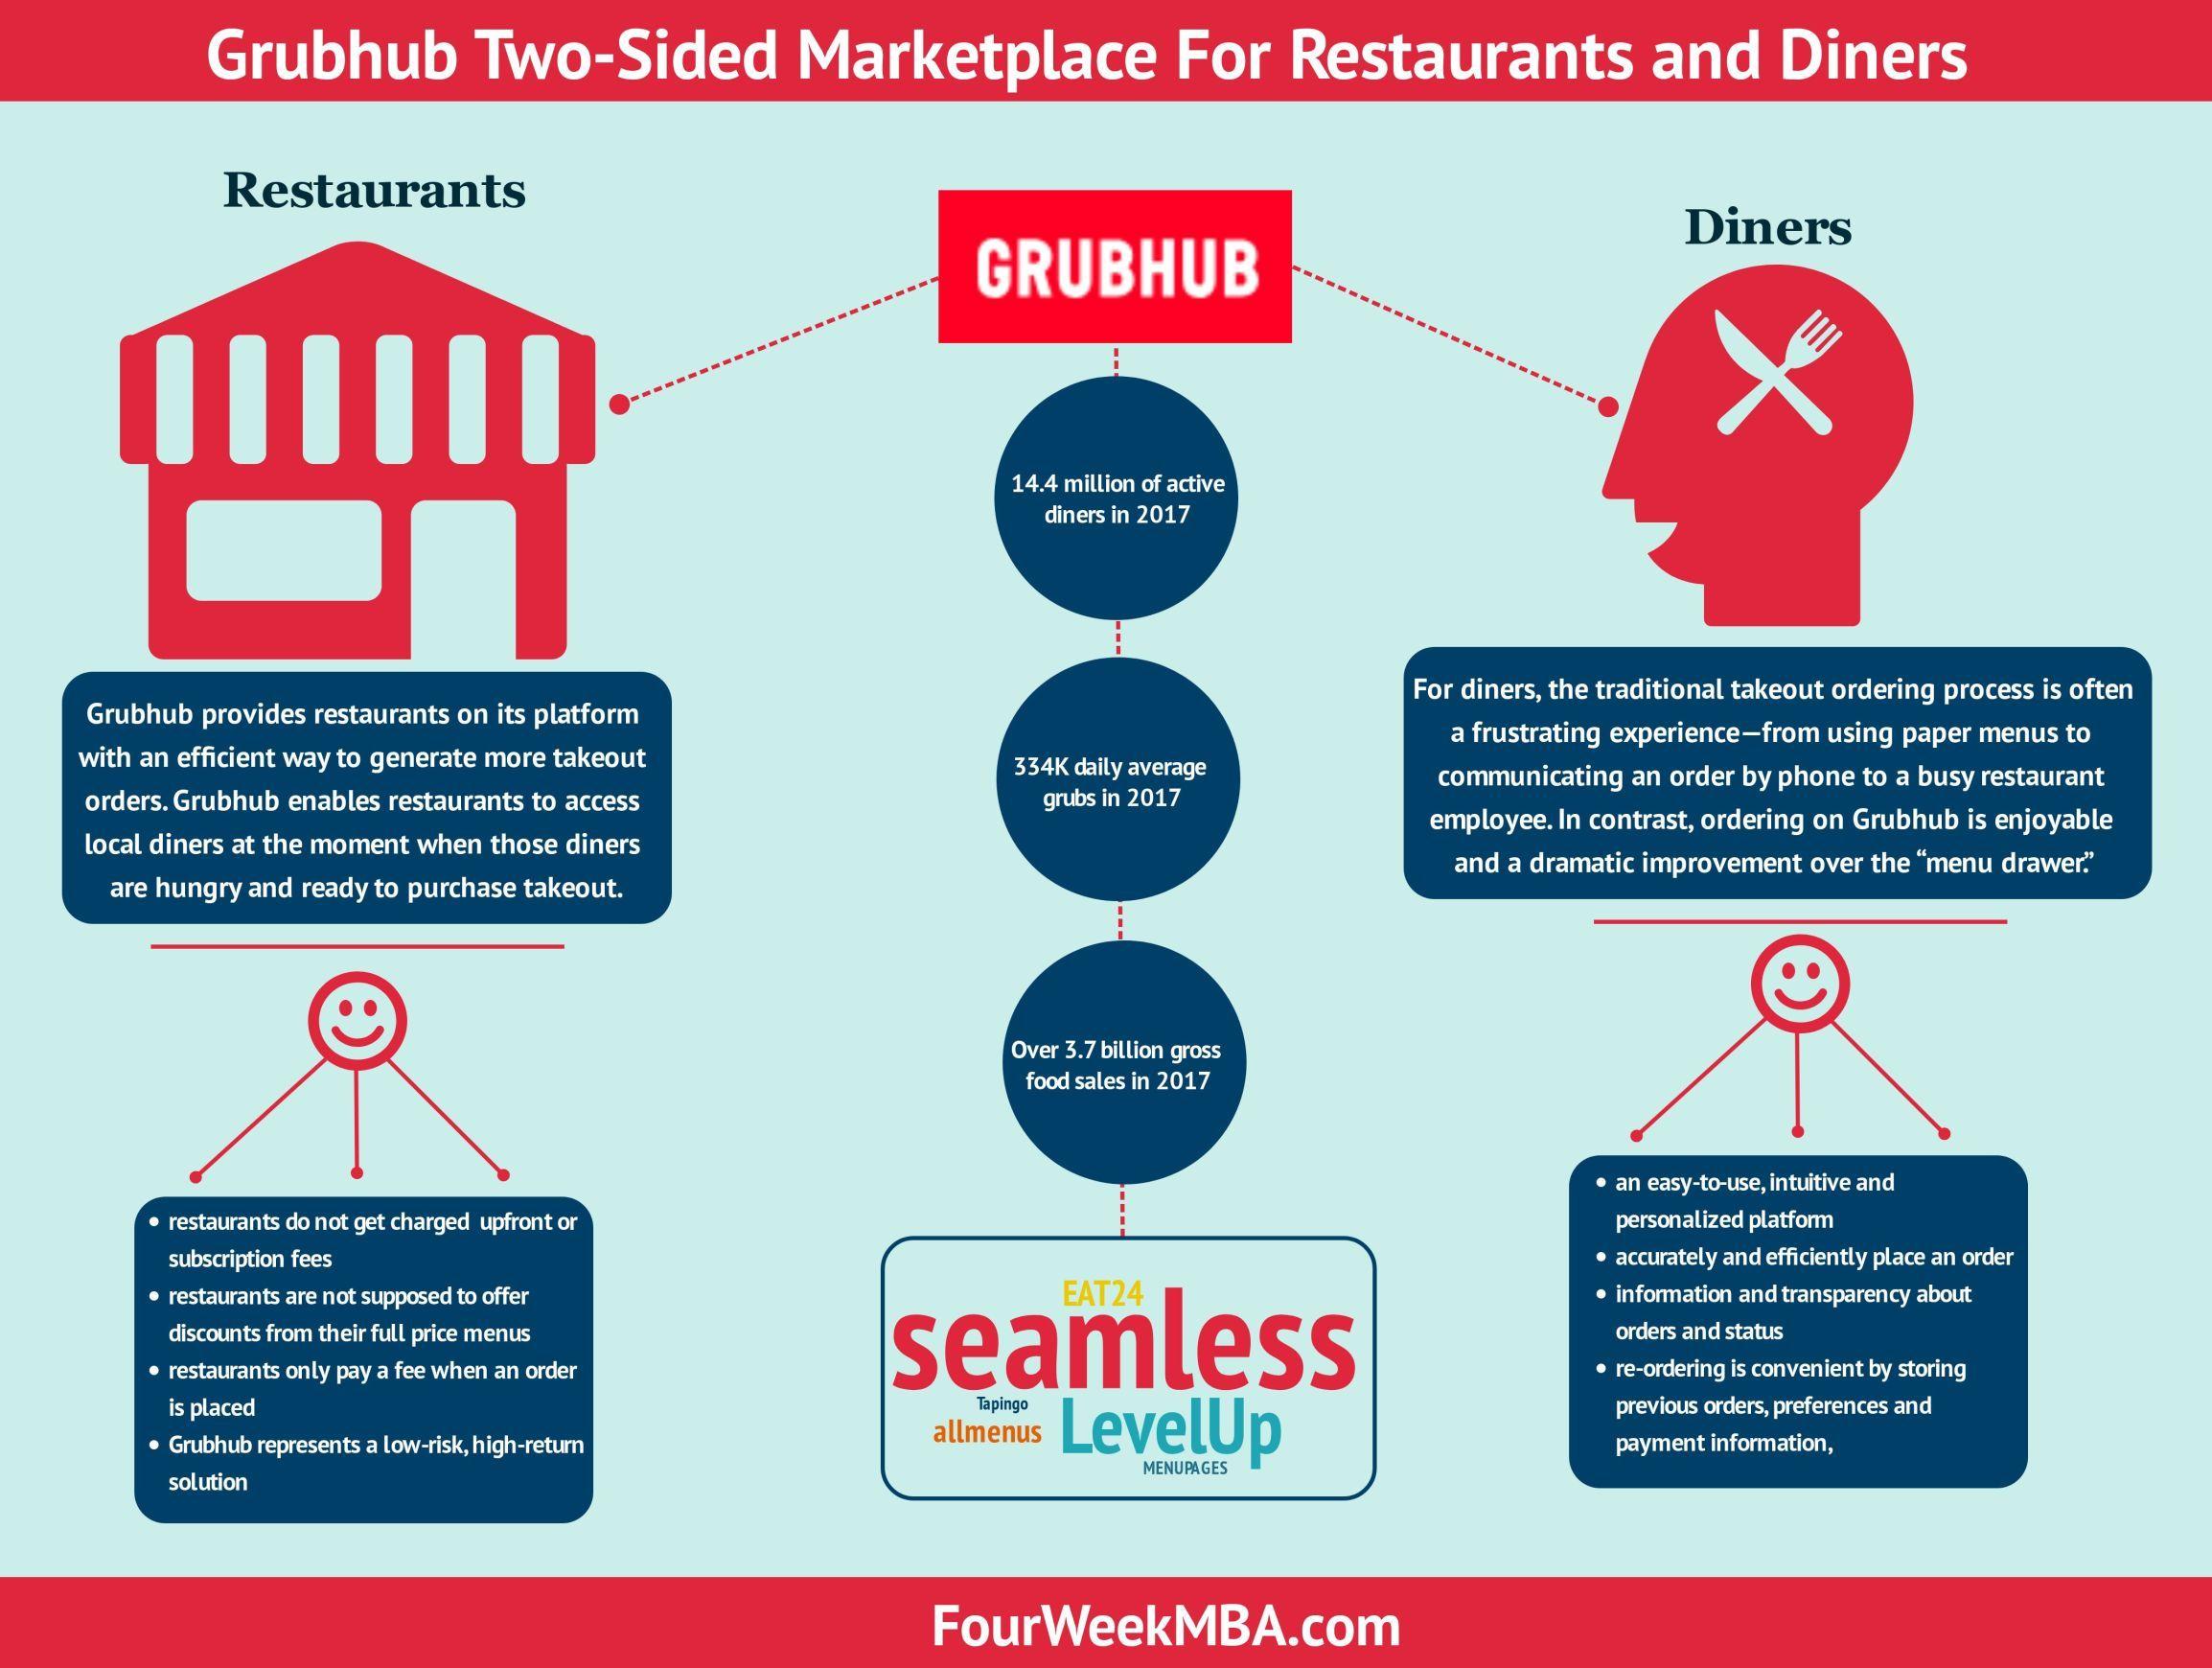 How Does Grubhub Make Money Grubhub Business Model In A